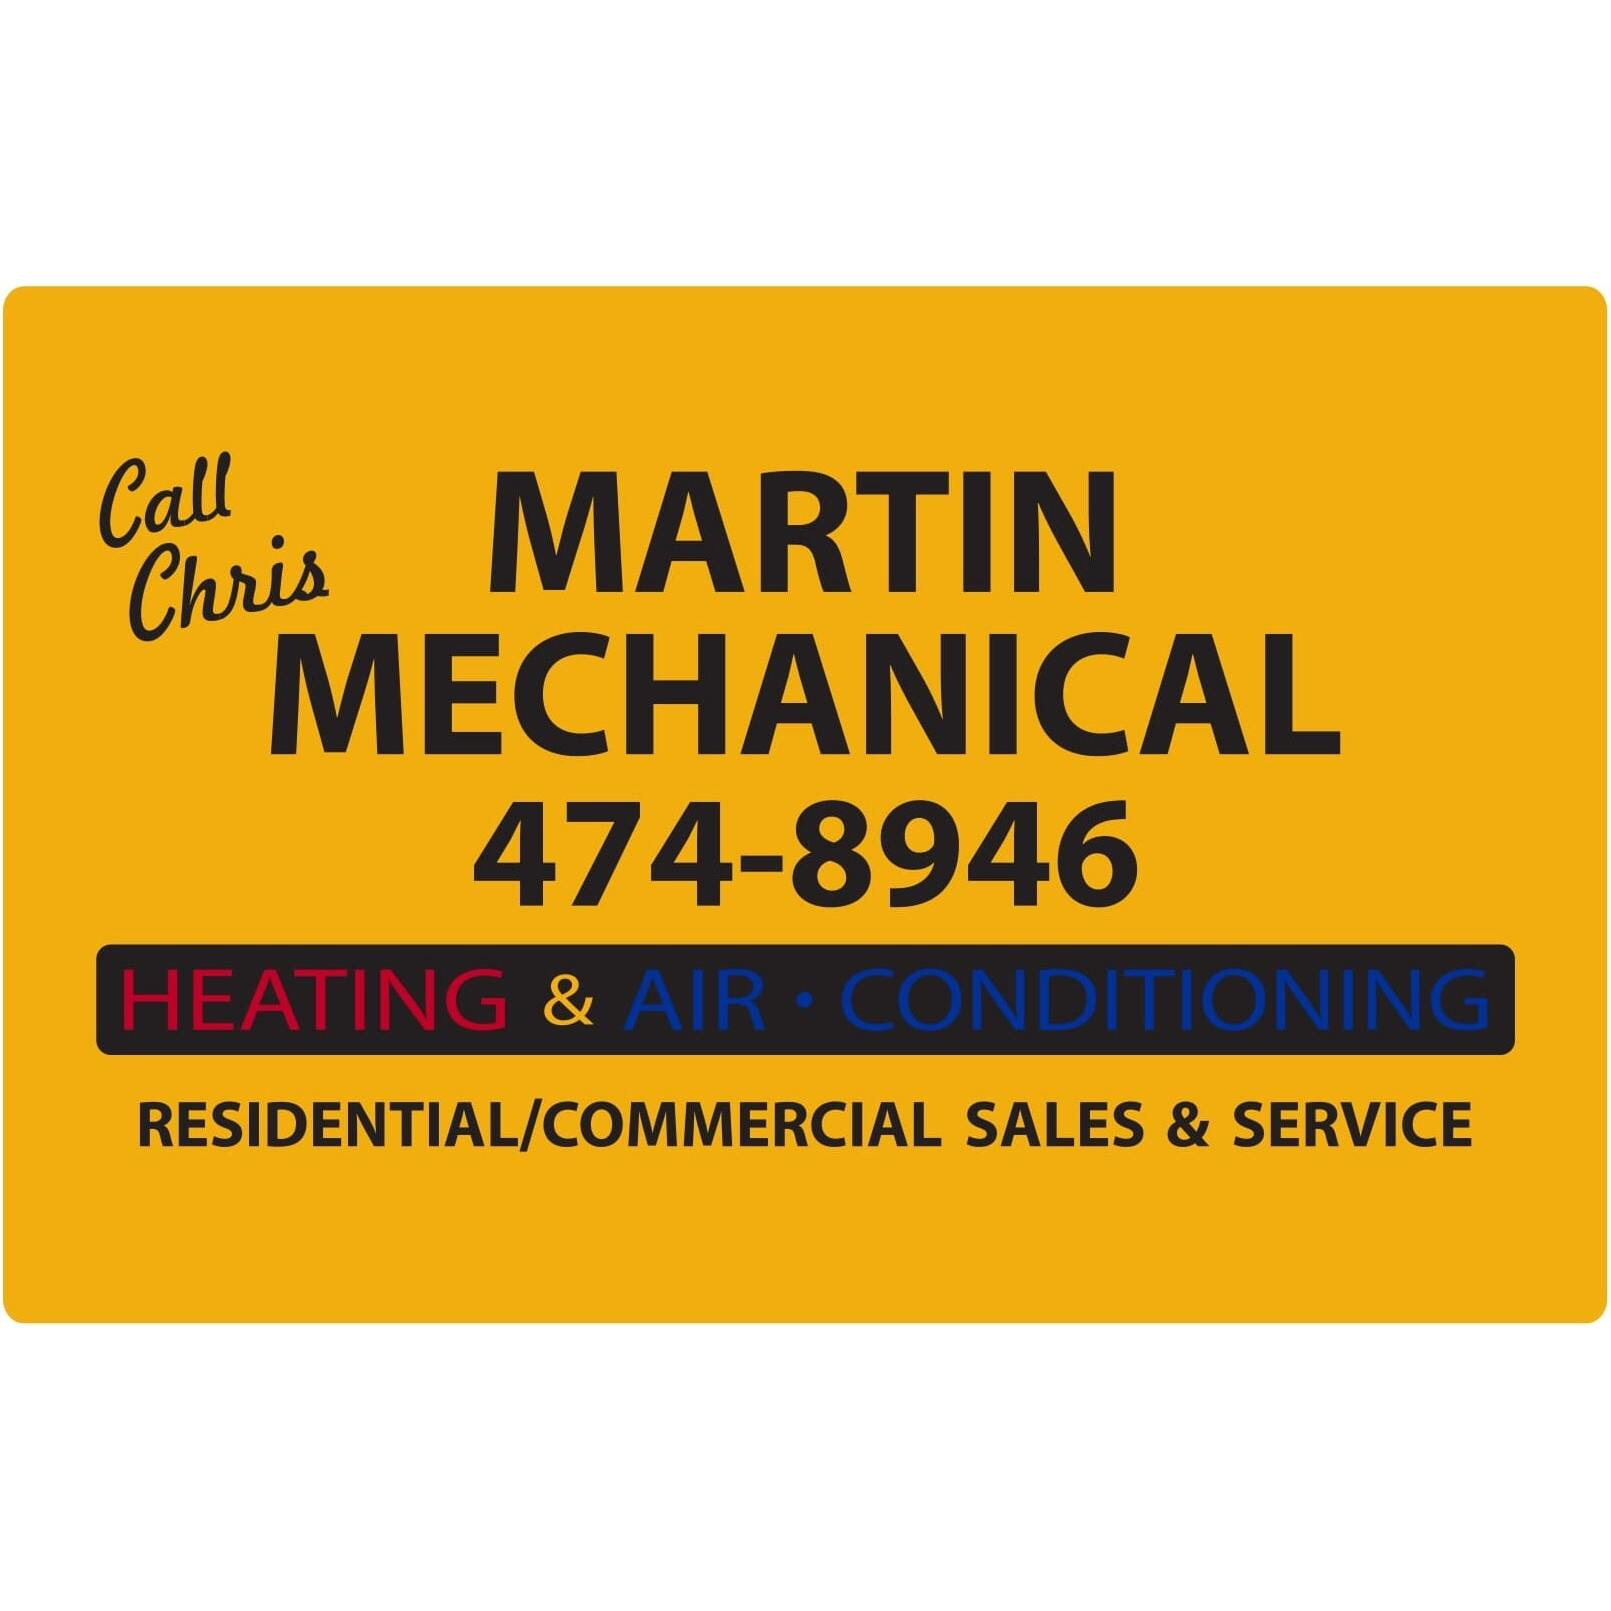 Martin Mechanical Services